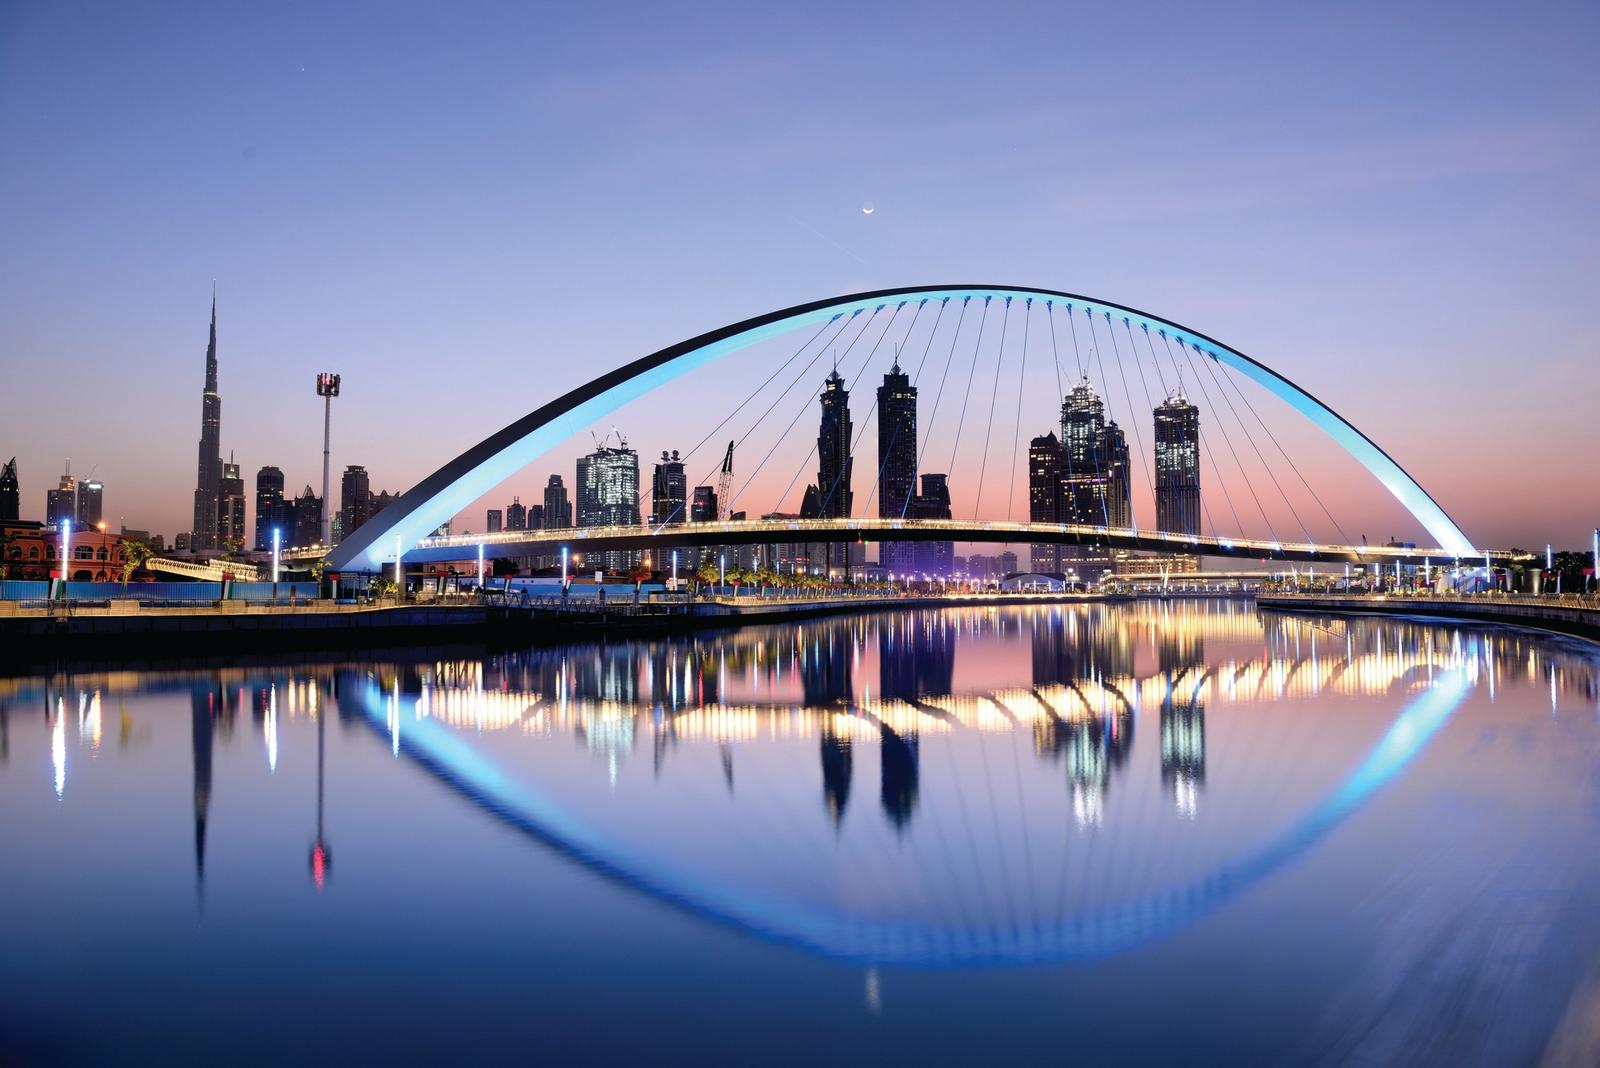 Vista panoramica di notte di Dubai illuminata